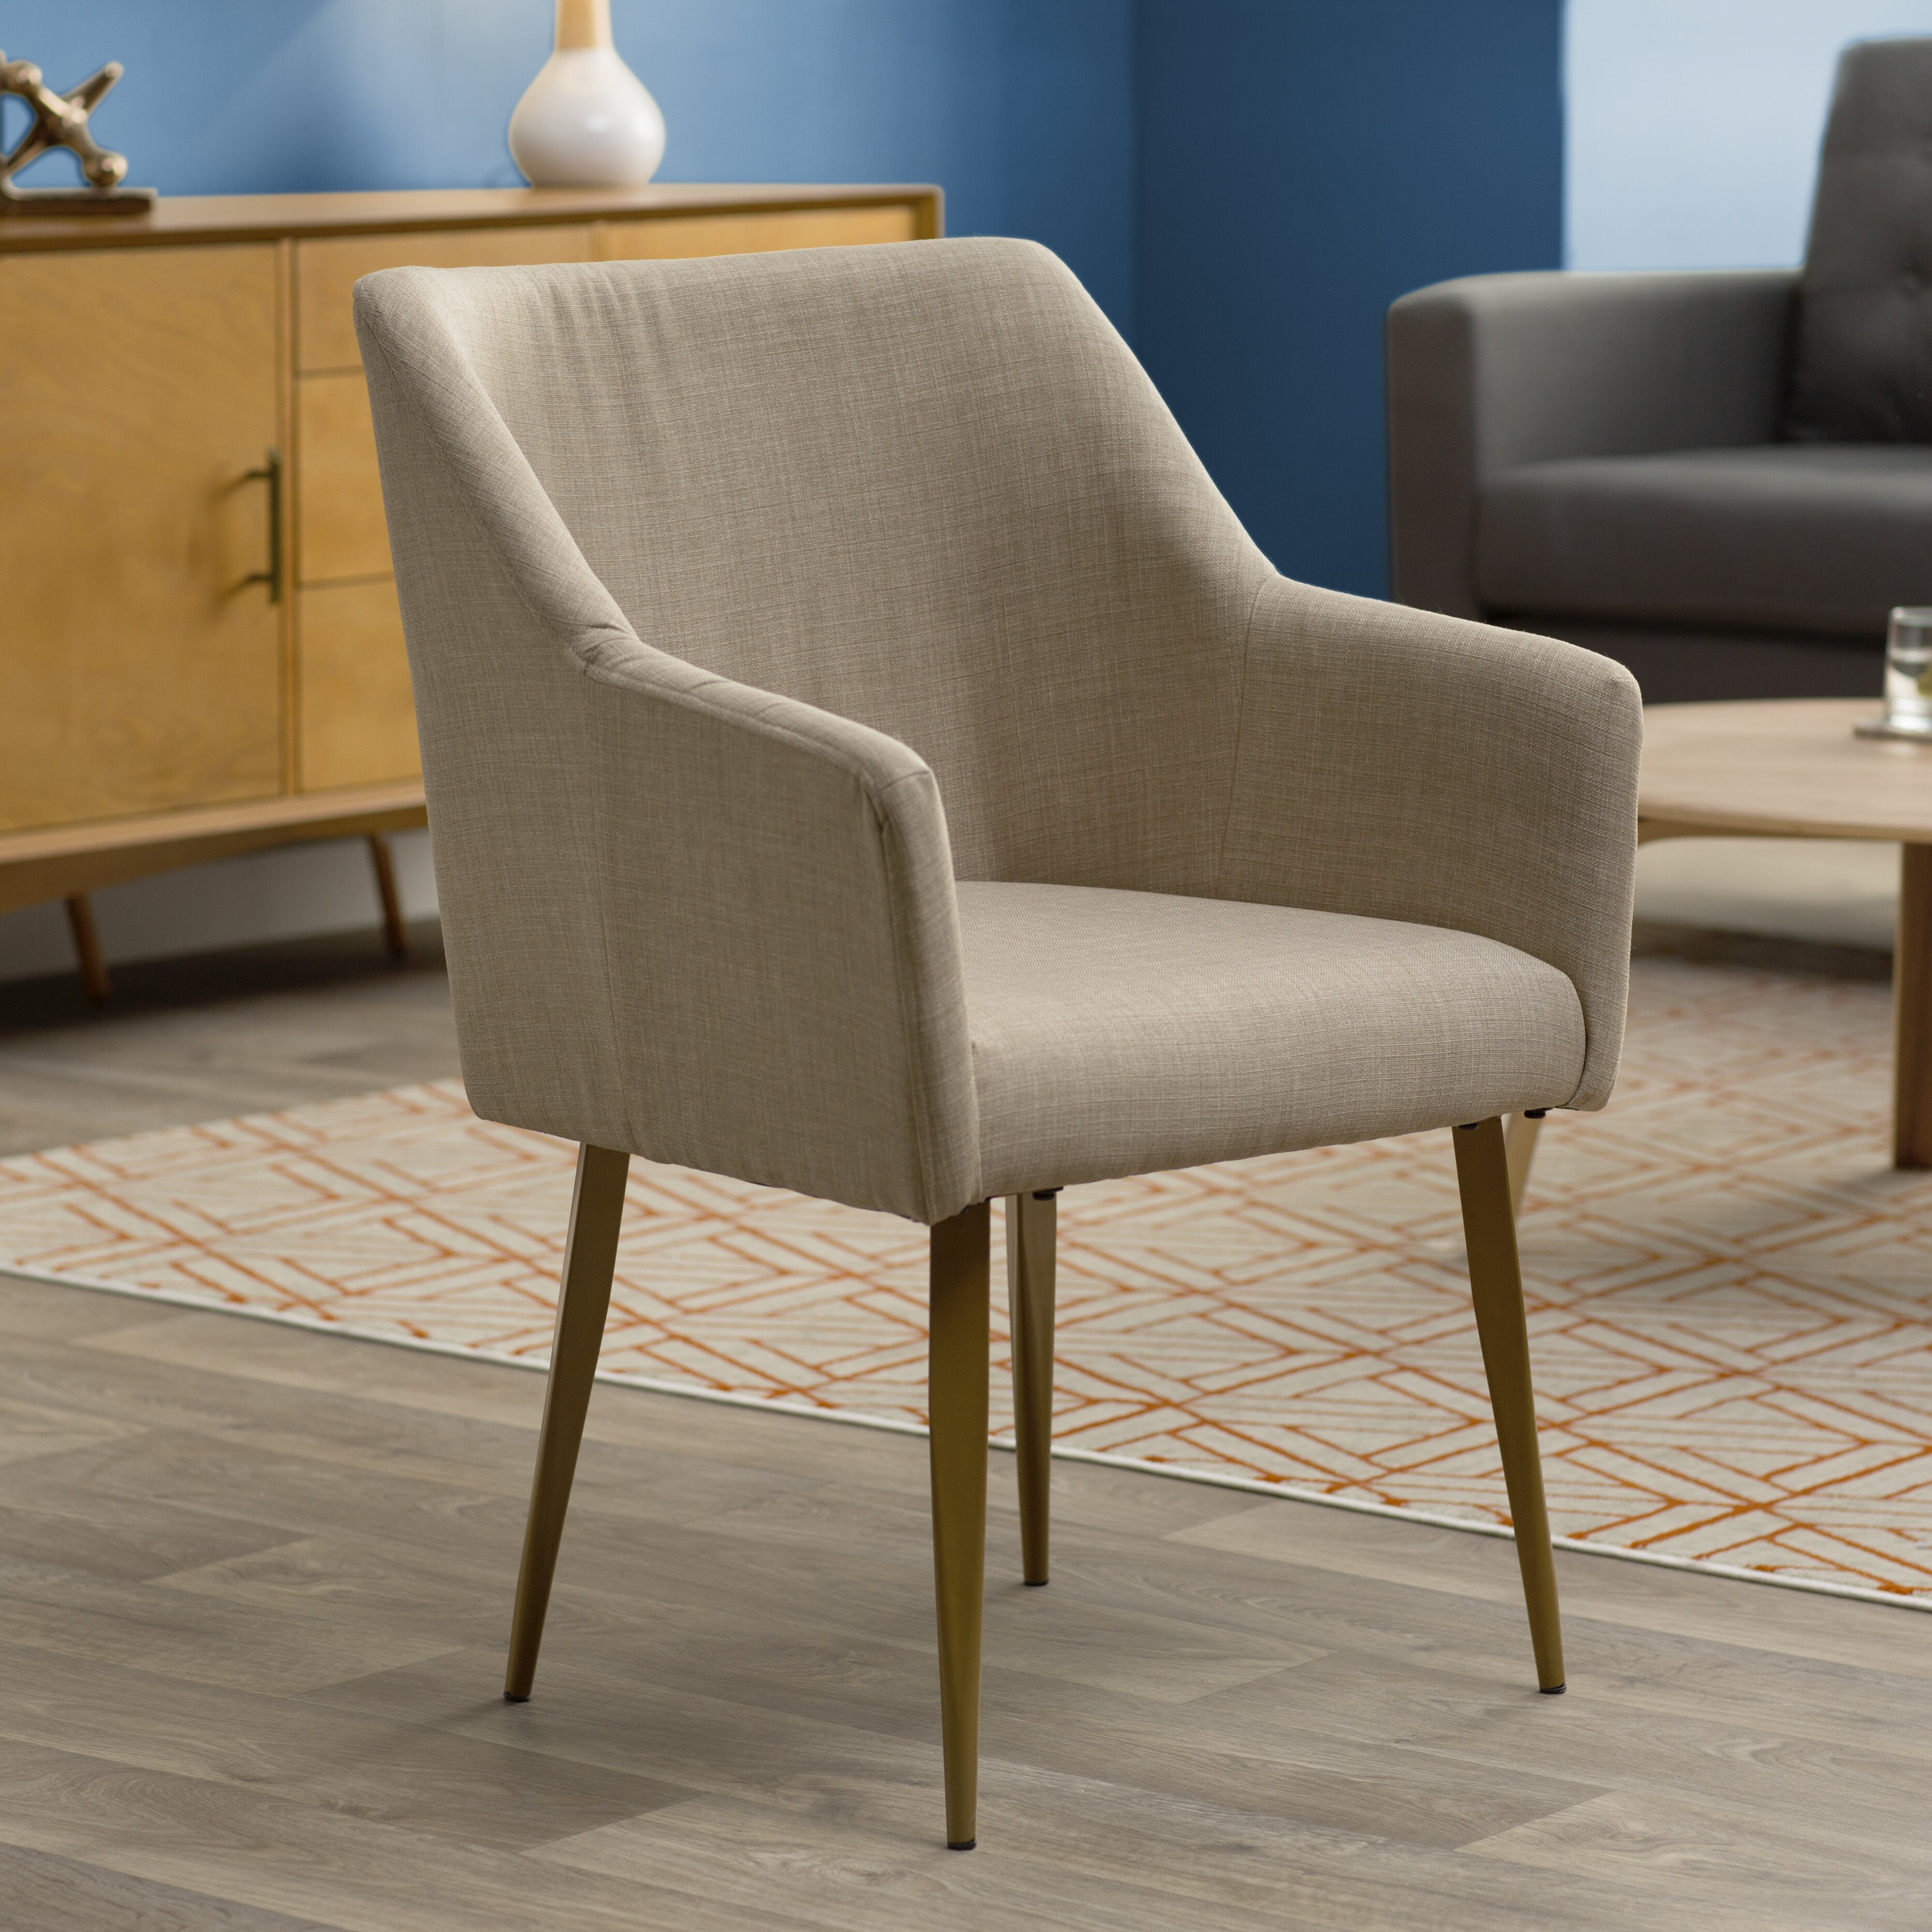 Langley street hemet arm chair reviews wayfair for Outdoor furniture langley